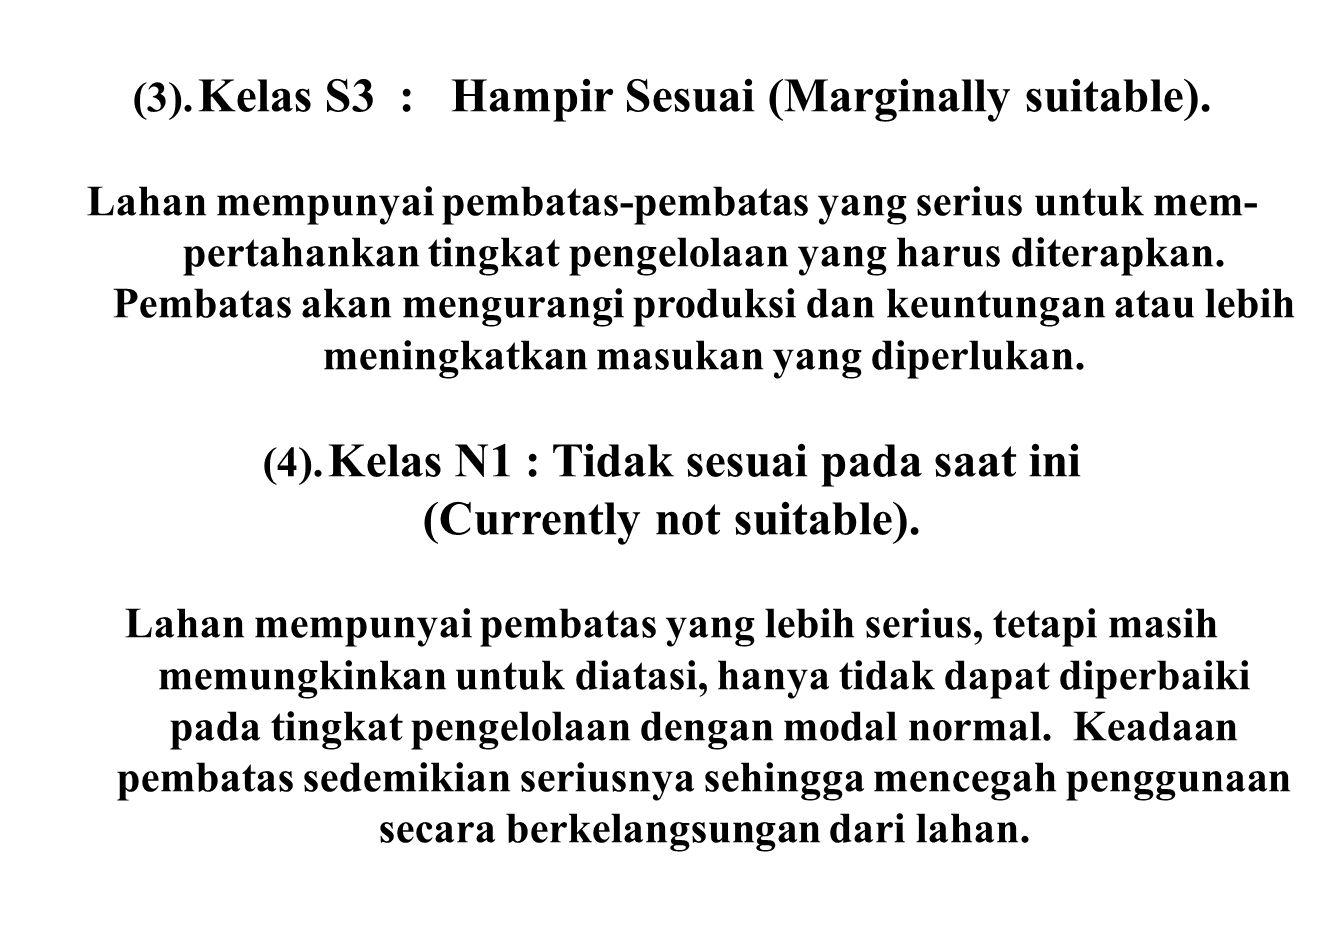 (3). Kelas S3 : Hampir Sesuai (Marginally suitable). Lahan mempunyai pembatas-pembatas yang serius untuk mem pertahankan tingkat pengelolaan yang har